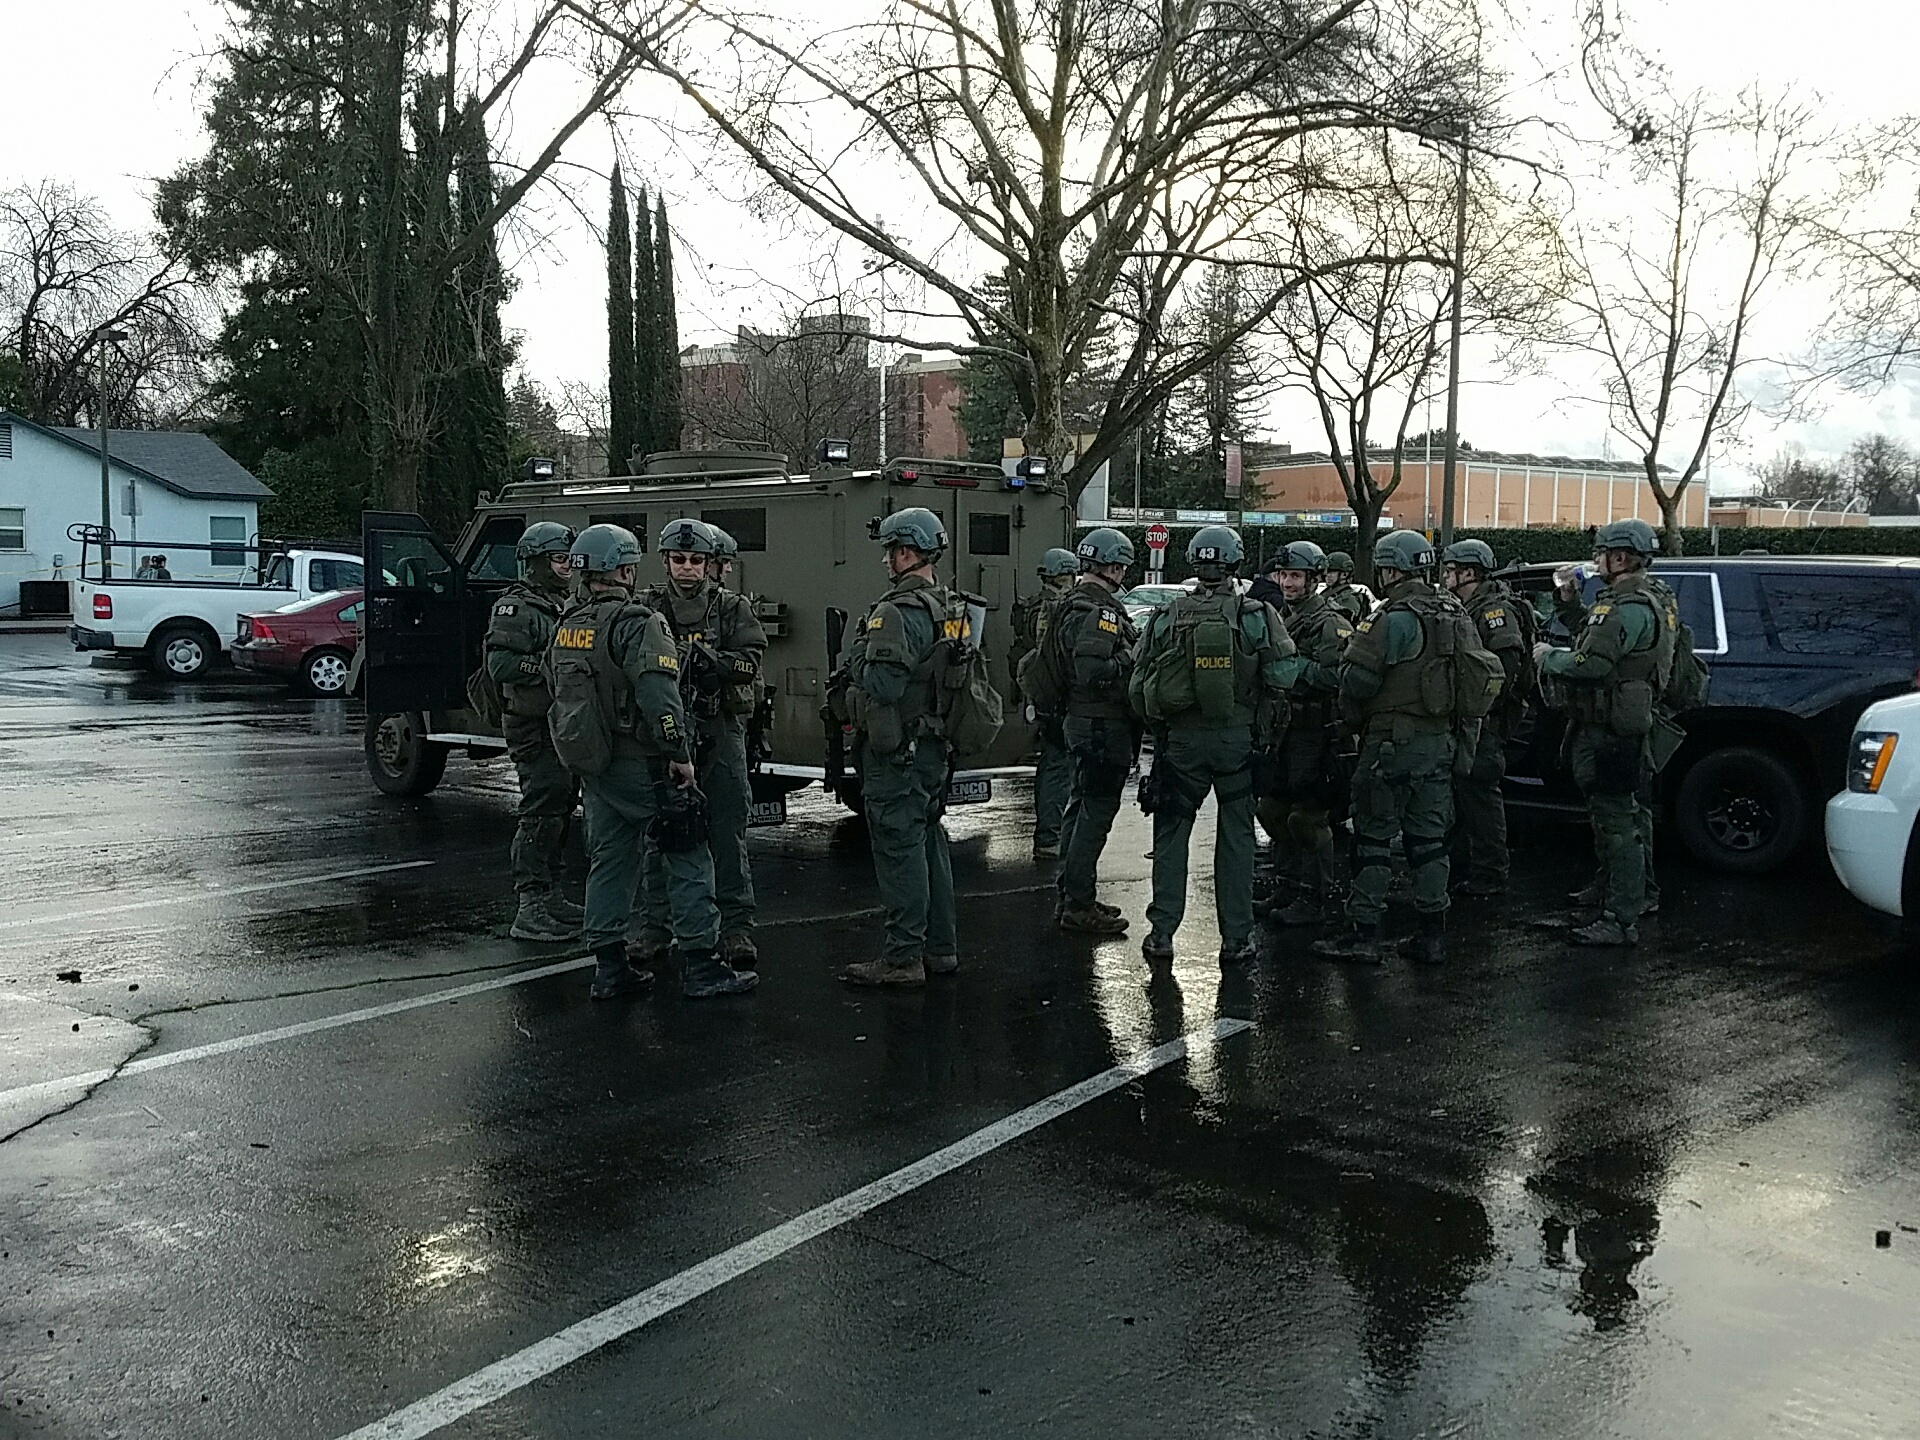 SWAT team waiting to conduct raid. Photo credit: Daniel Wright